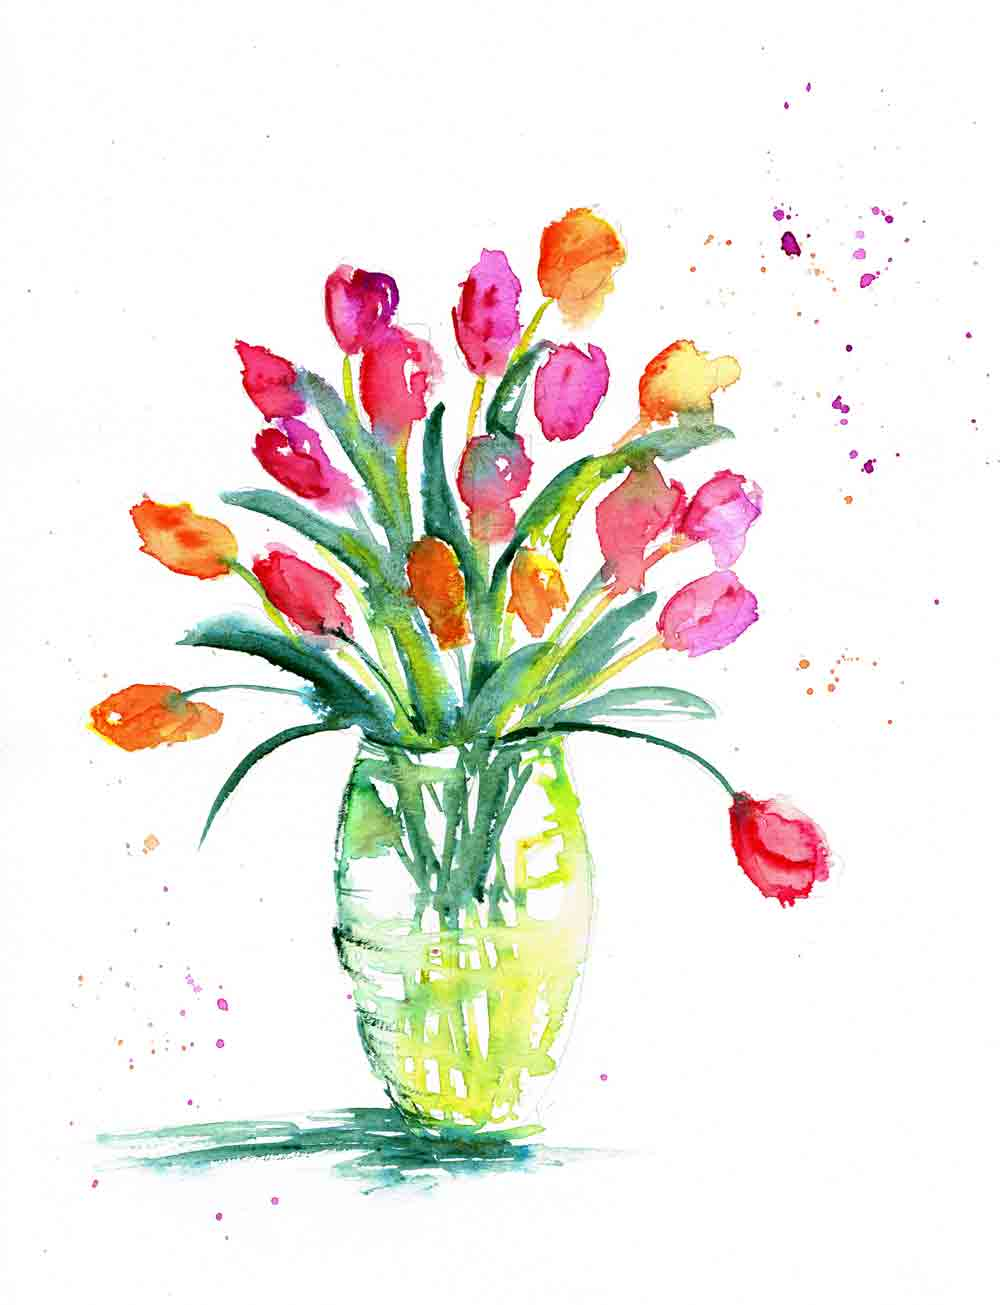 Tulips-no-8-vase-kw.jpg